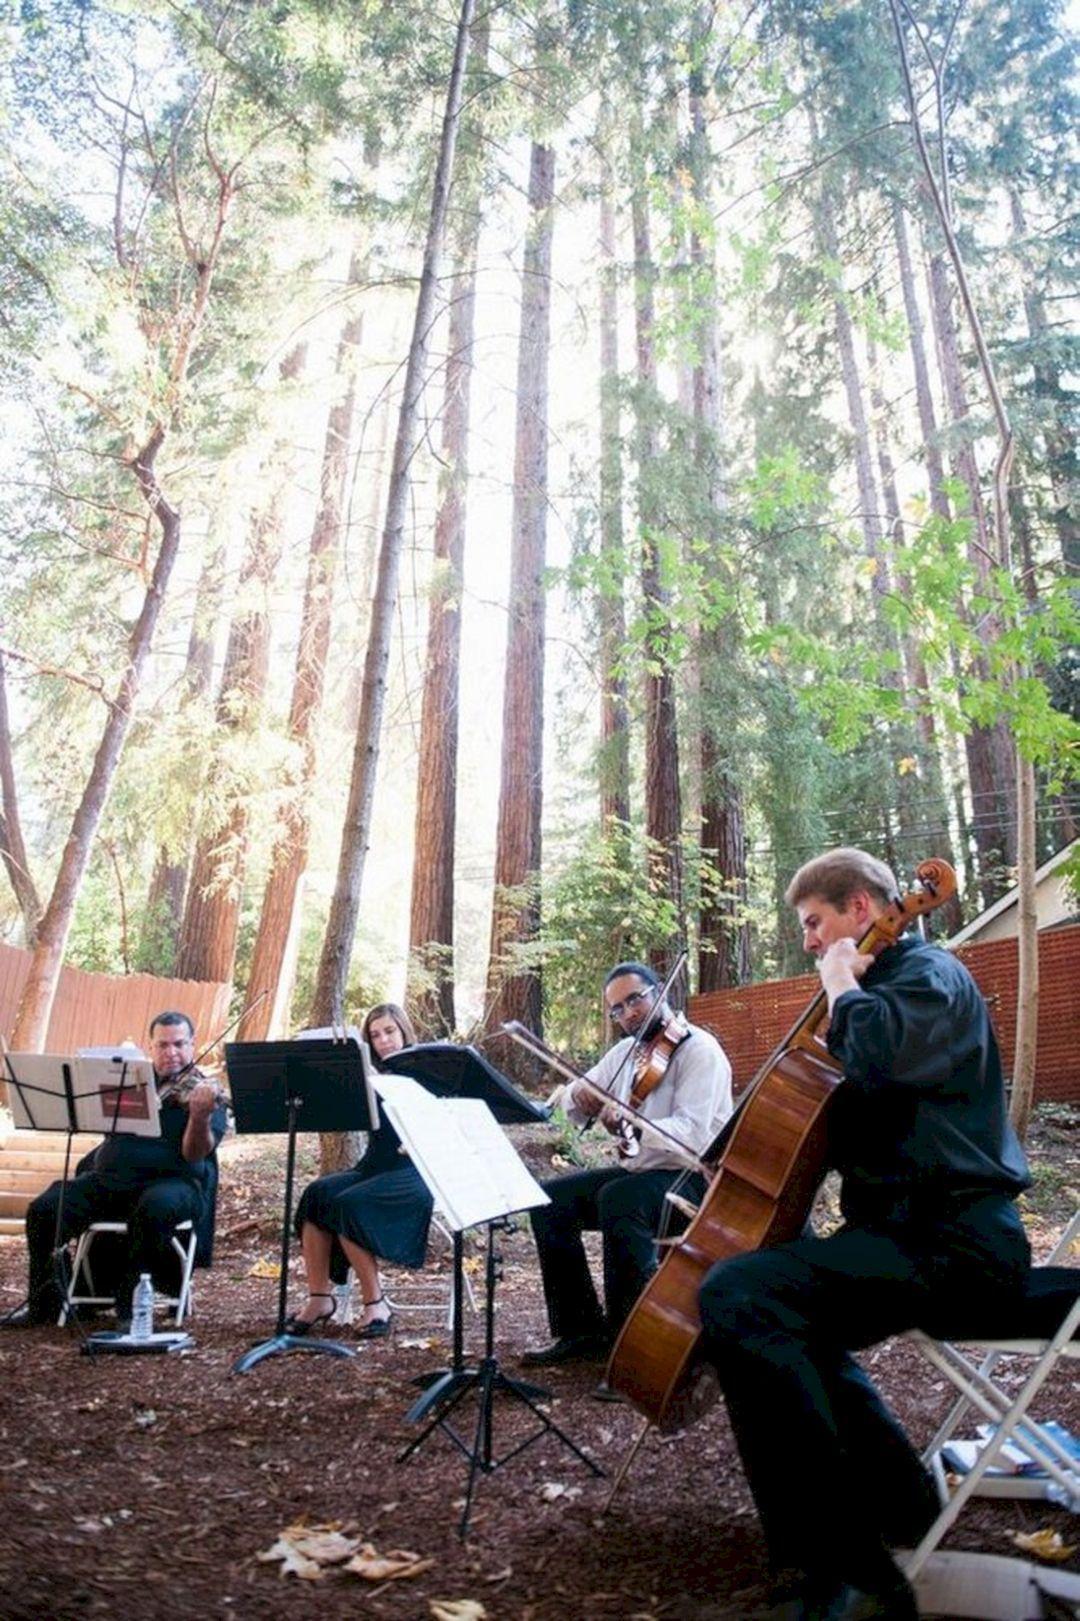 Redwood Forest Wedding Venues 3 | Redwood wedding, Redwood ...